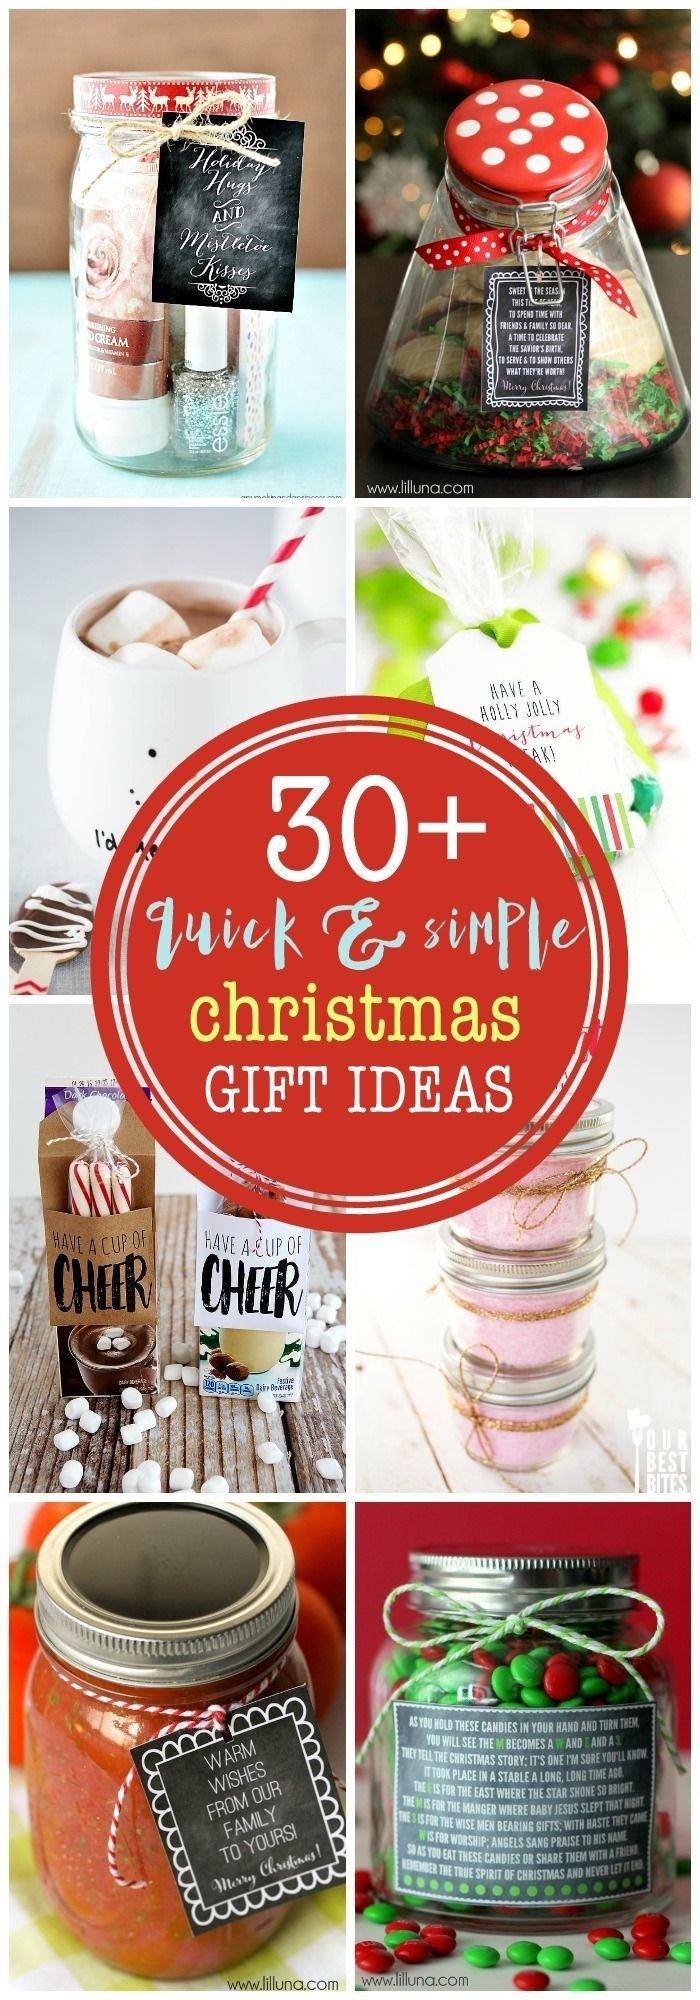 10 Fabulous Cute Gift Ideas For Her 404 best handmade gifts images on pinterest gift ideas handmade 2021